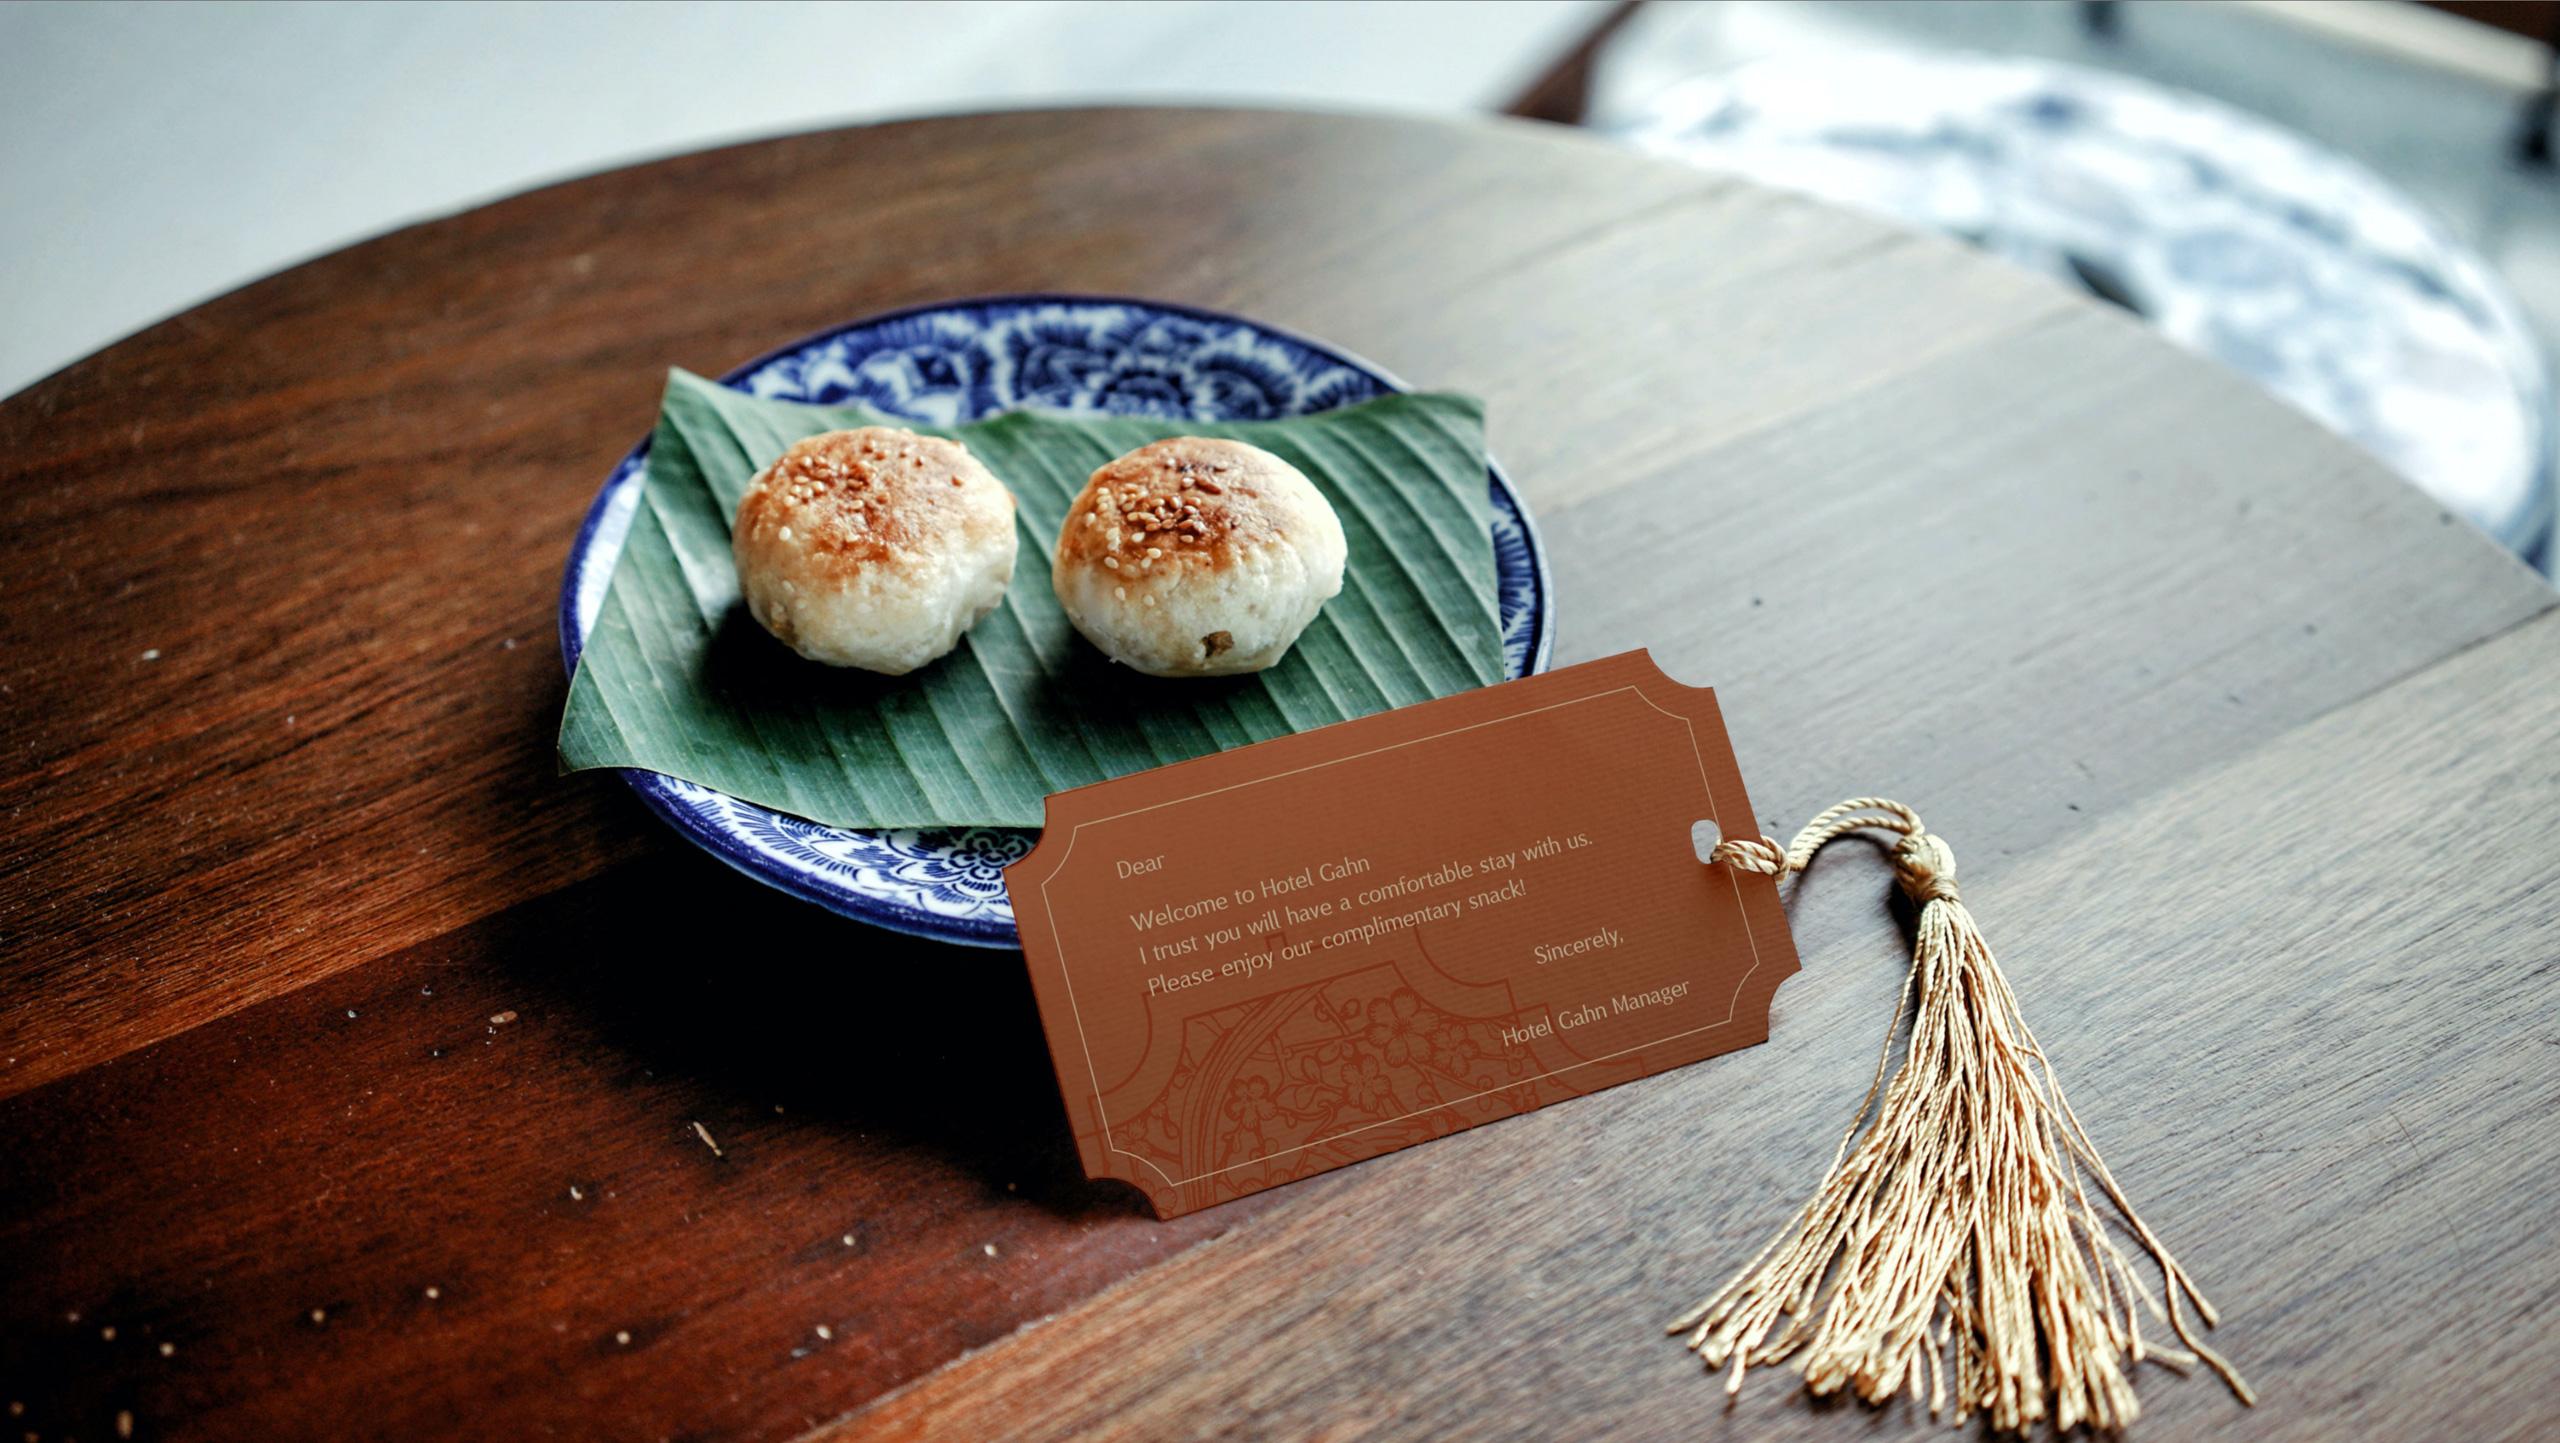 Welcome Snack | Hotel Gahn | Simplisis Design Studio | Branding Design Agency in Phuket